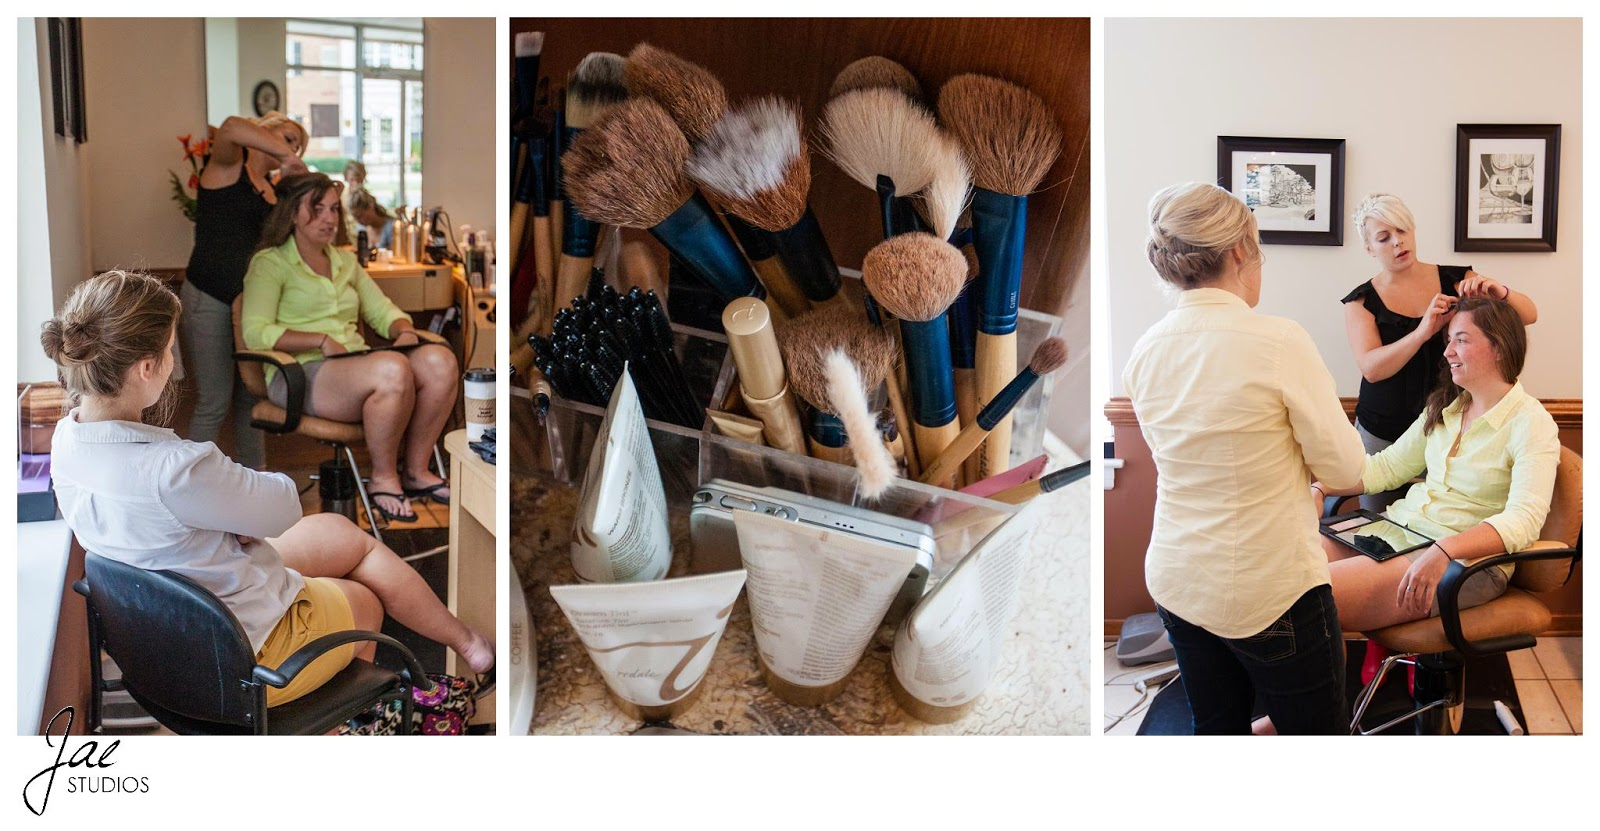 Jonathan and Julie, Bird cage, West Manor Estate, Wedding, Lynchburg, Virginia, Jae Studios, bride, wedding party, bridesmaids, makeup, hair, style, getting ready, preparing, yellow, green, while, purple